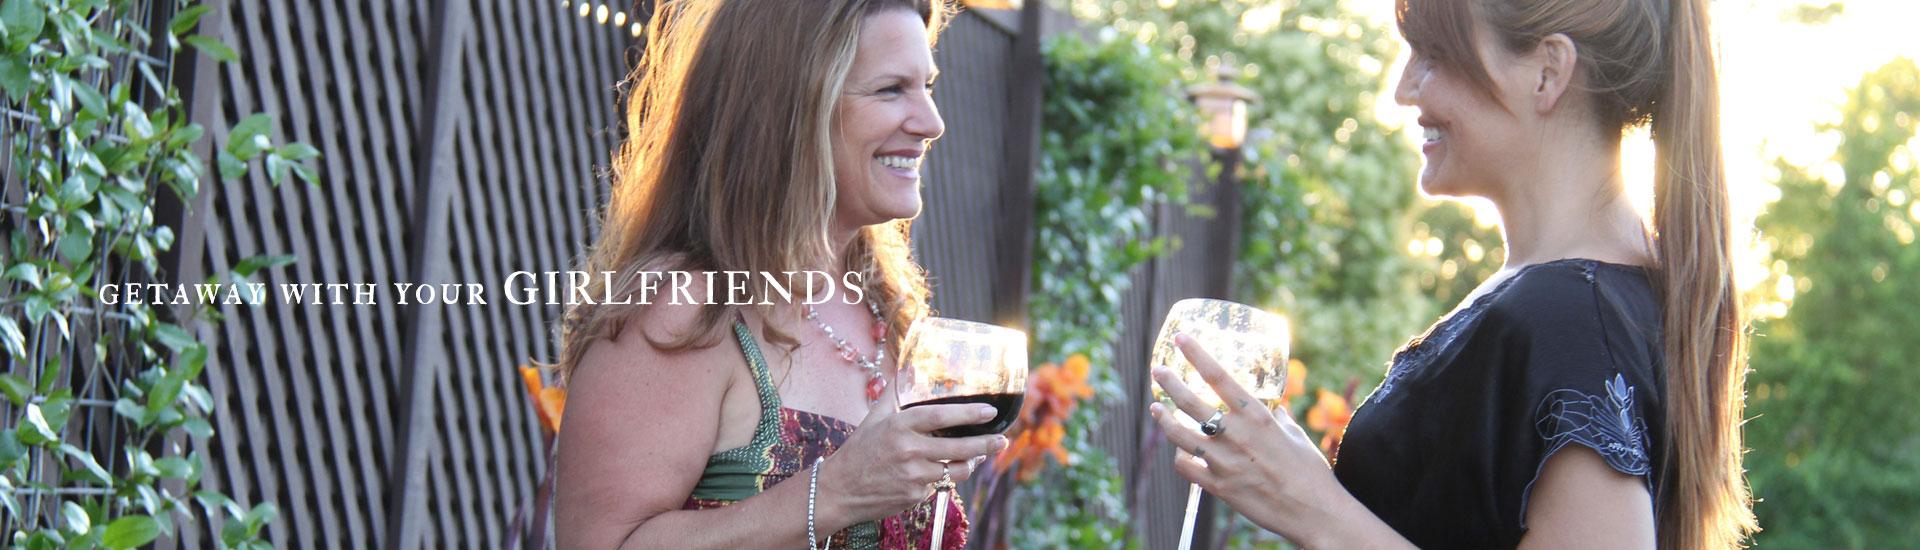 Girlfriends napa valley spa getaway women 39 s group for Best spas for girlfriend getaway